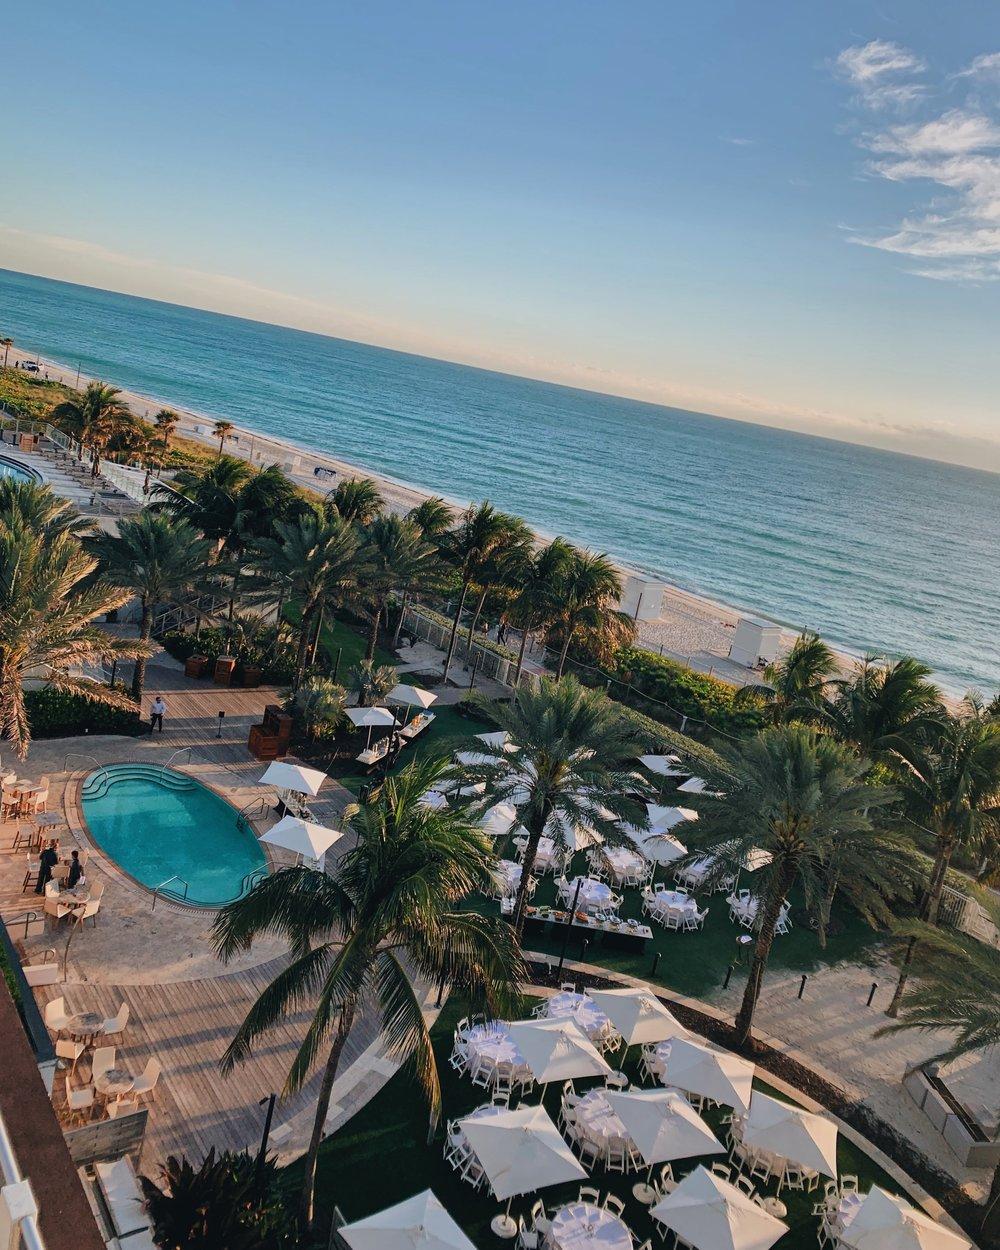 Nobu Beach Hotel - Miami Beach, Florida